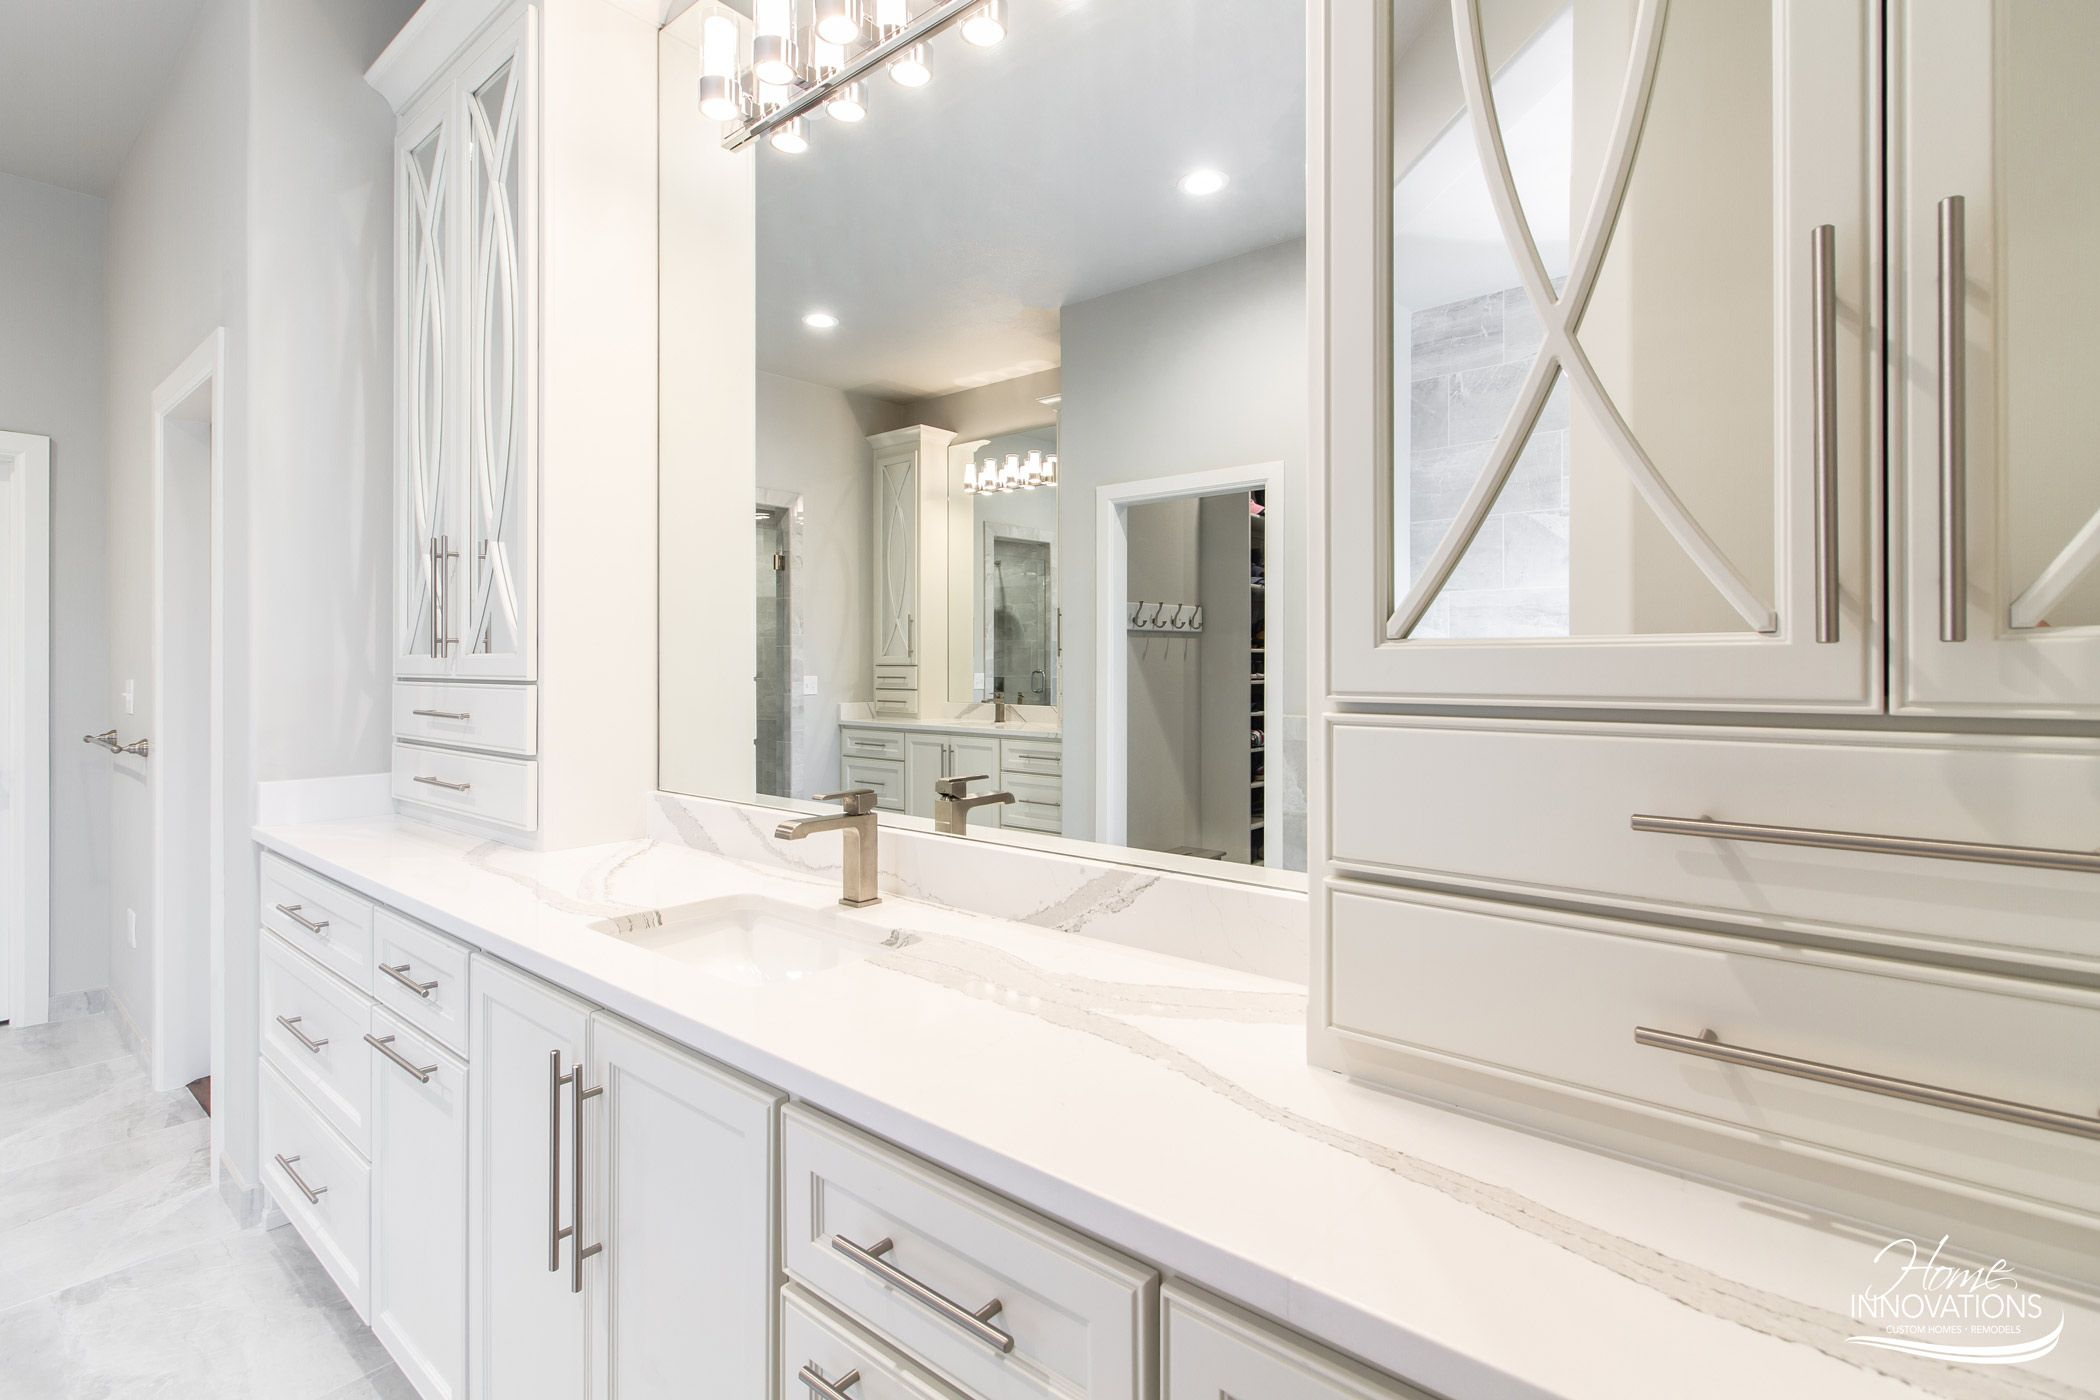 Master Bathroom Remodel Tulsa Ok White Cabinets Tile Floor Mirrored Cabinet Doors Doubl Mirrored Cabinet Doors Bathroom Remodel Master Bathrooms Remodel